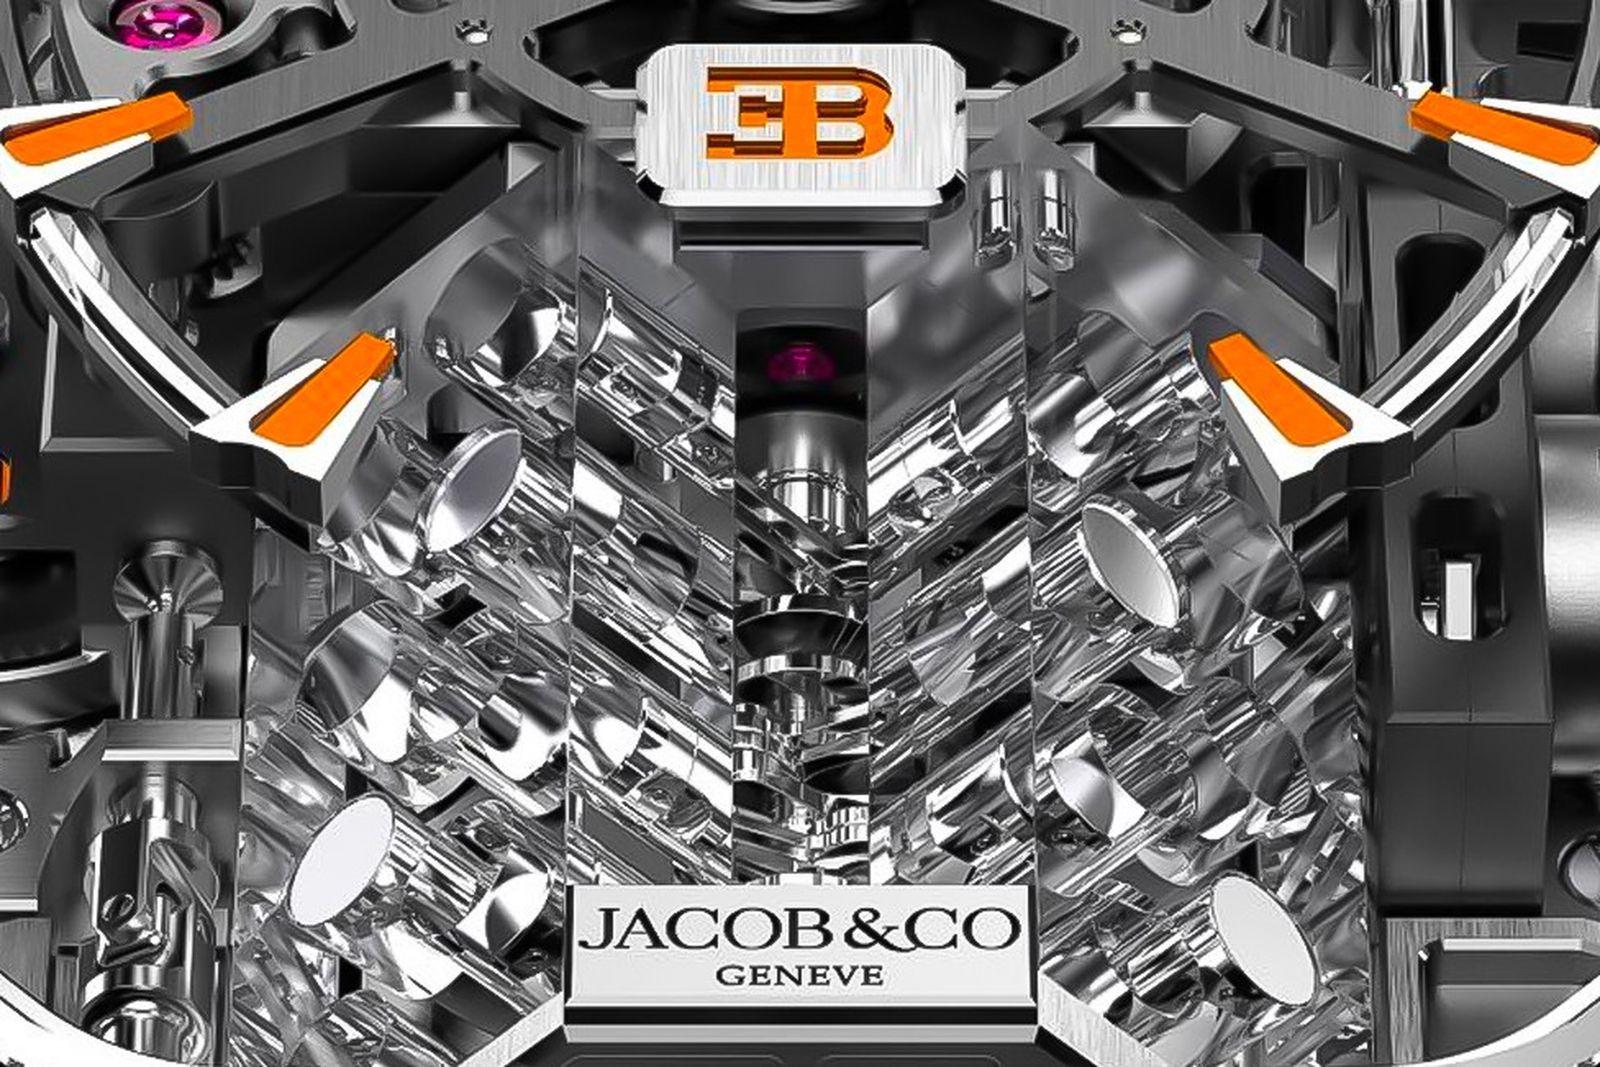 jacob-and-co-bugatti-chiron-tourbillon-black-orange-02